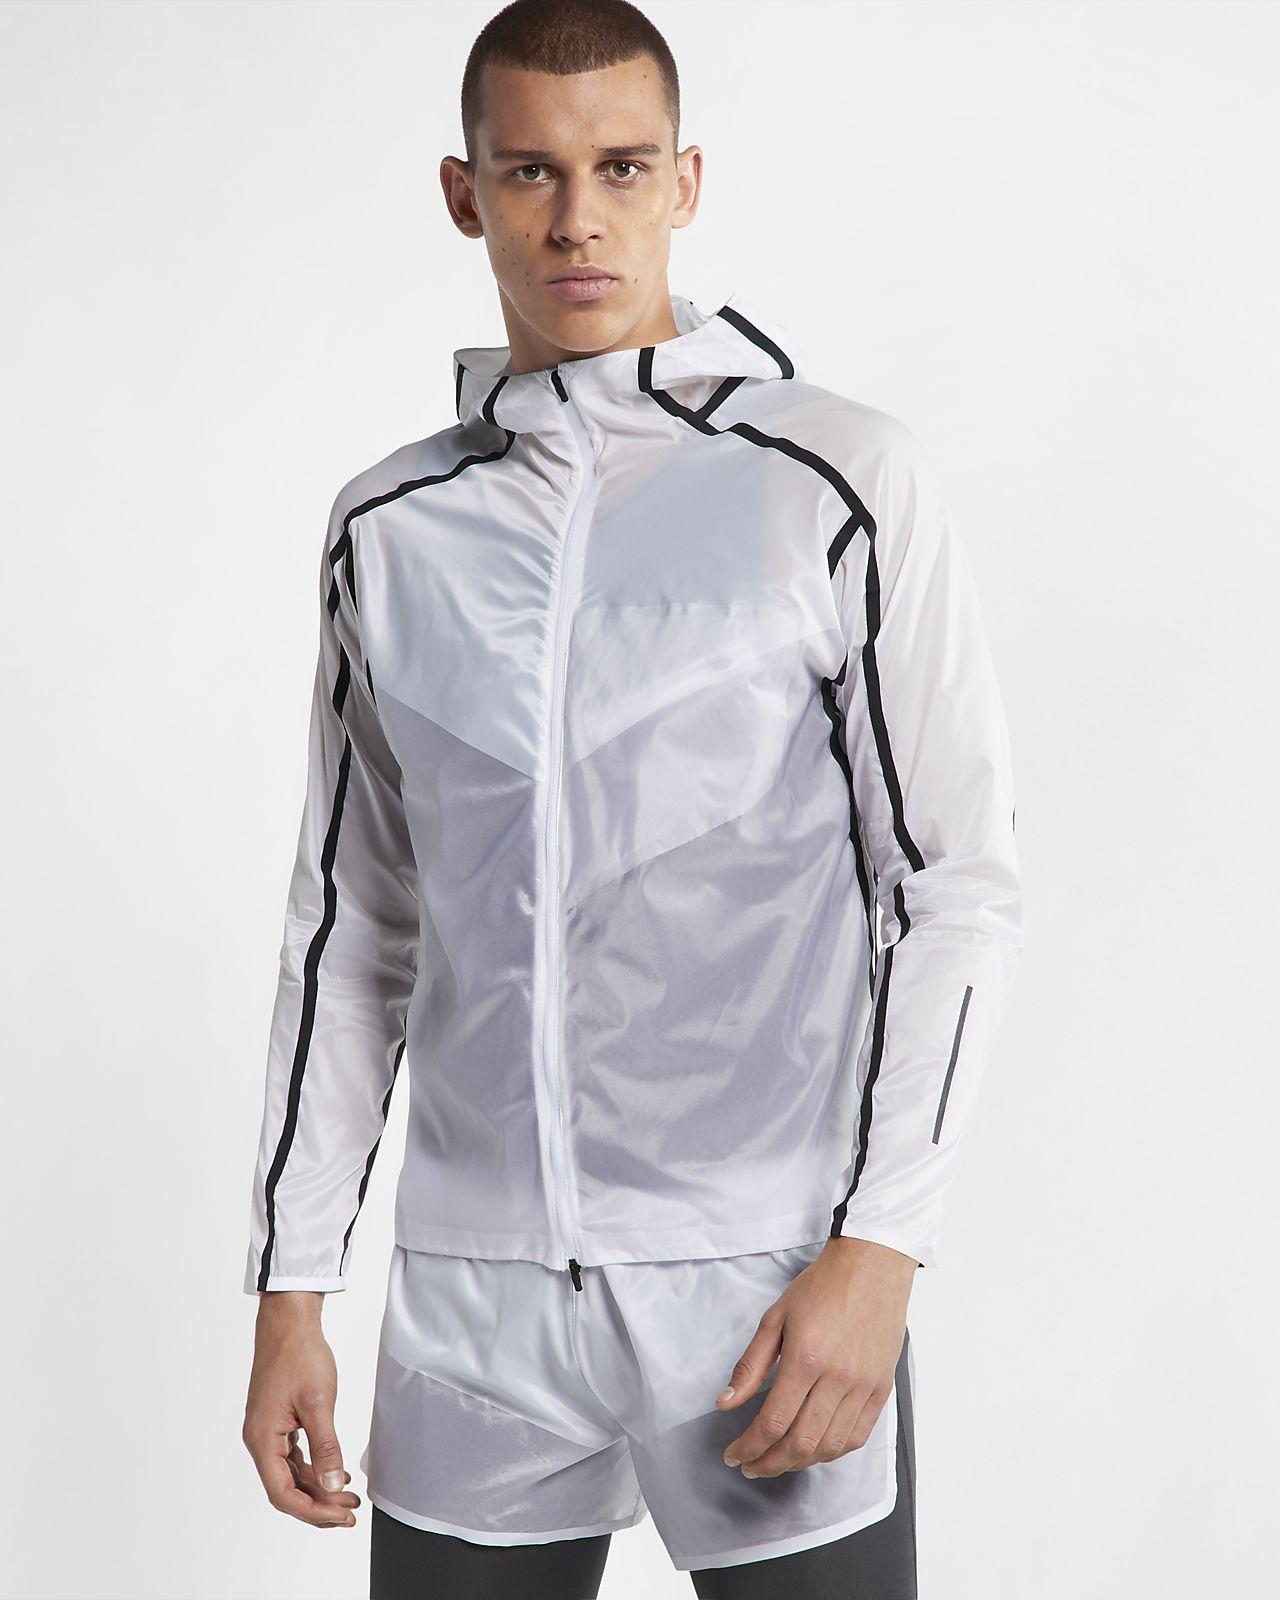 Nike Tech 男子跑步夹克